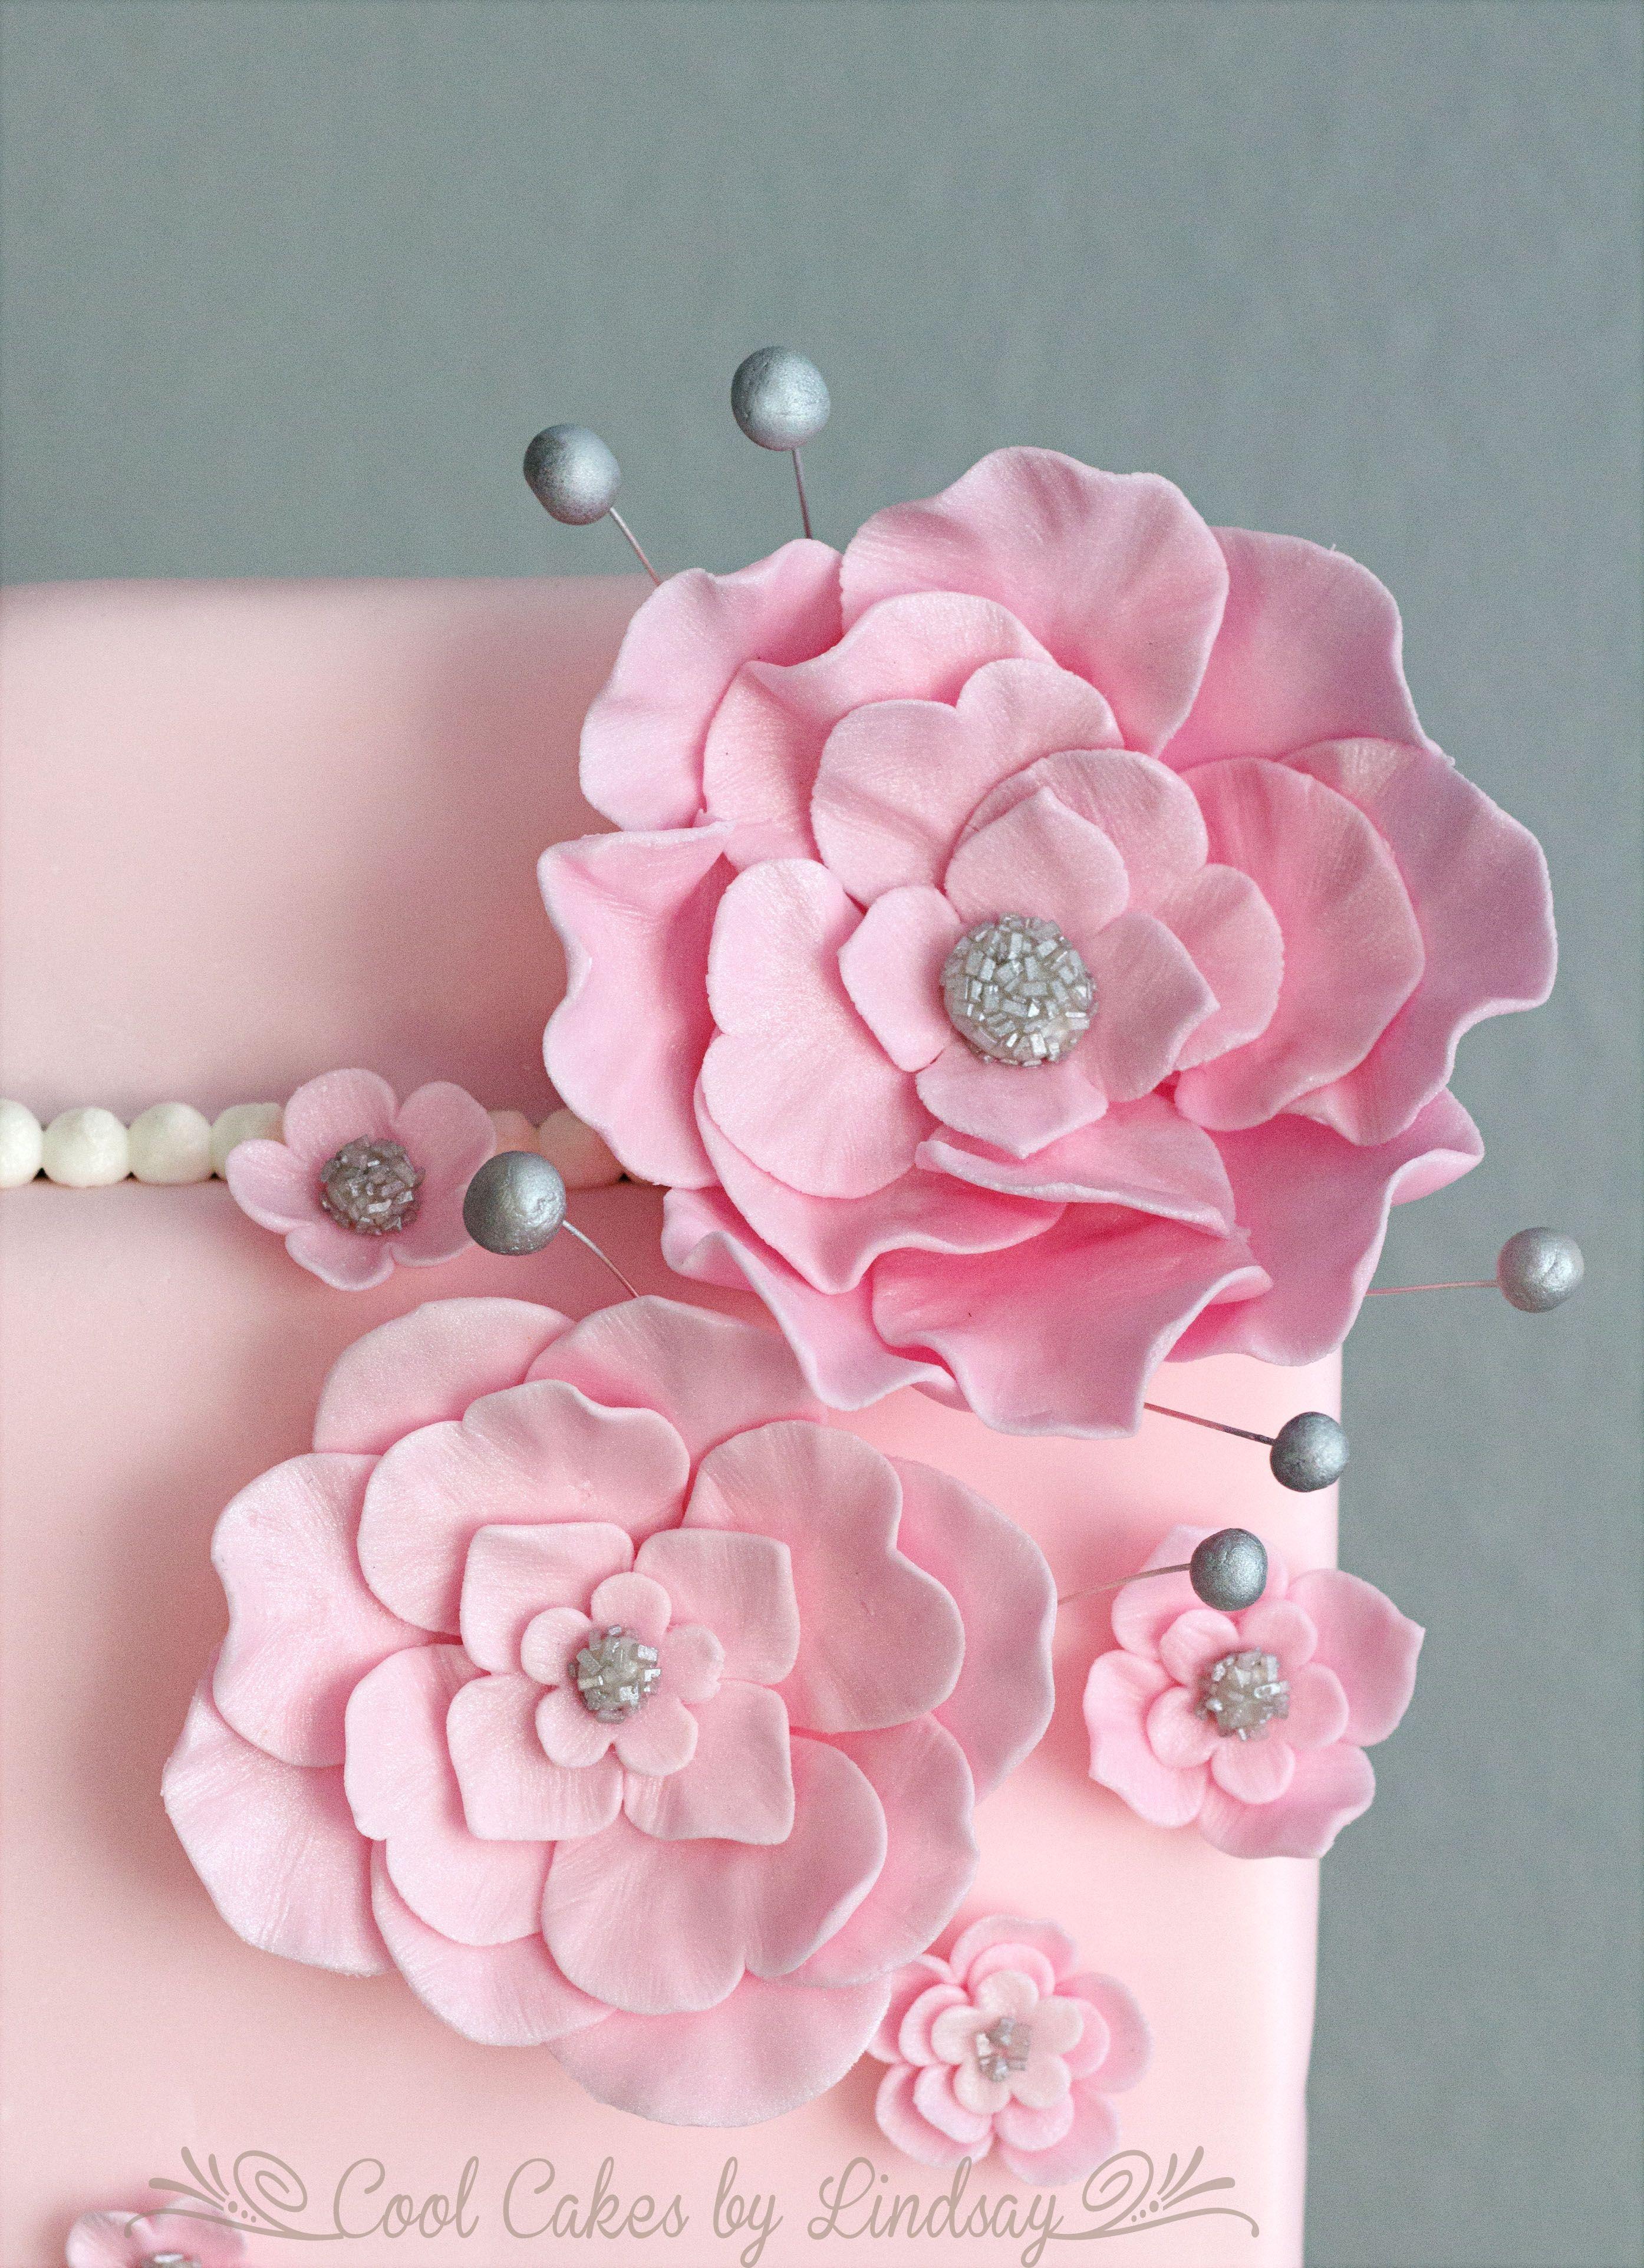 Pink fondant flowers flowers pinterest fondant flowers pink fondant flowers mightylinksfo